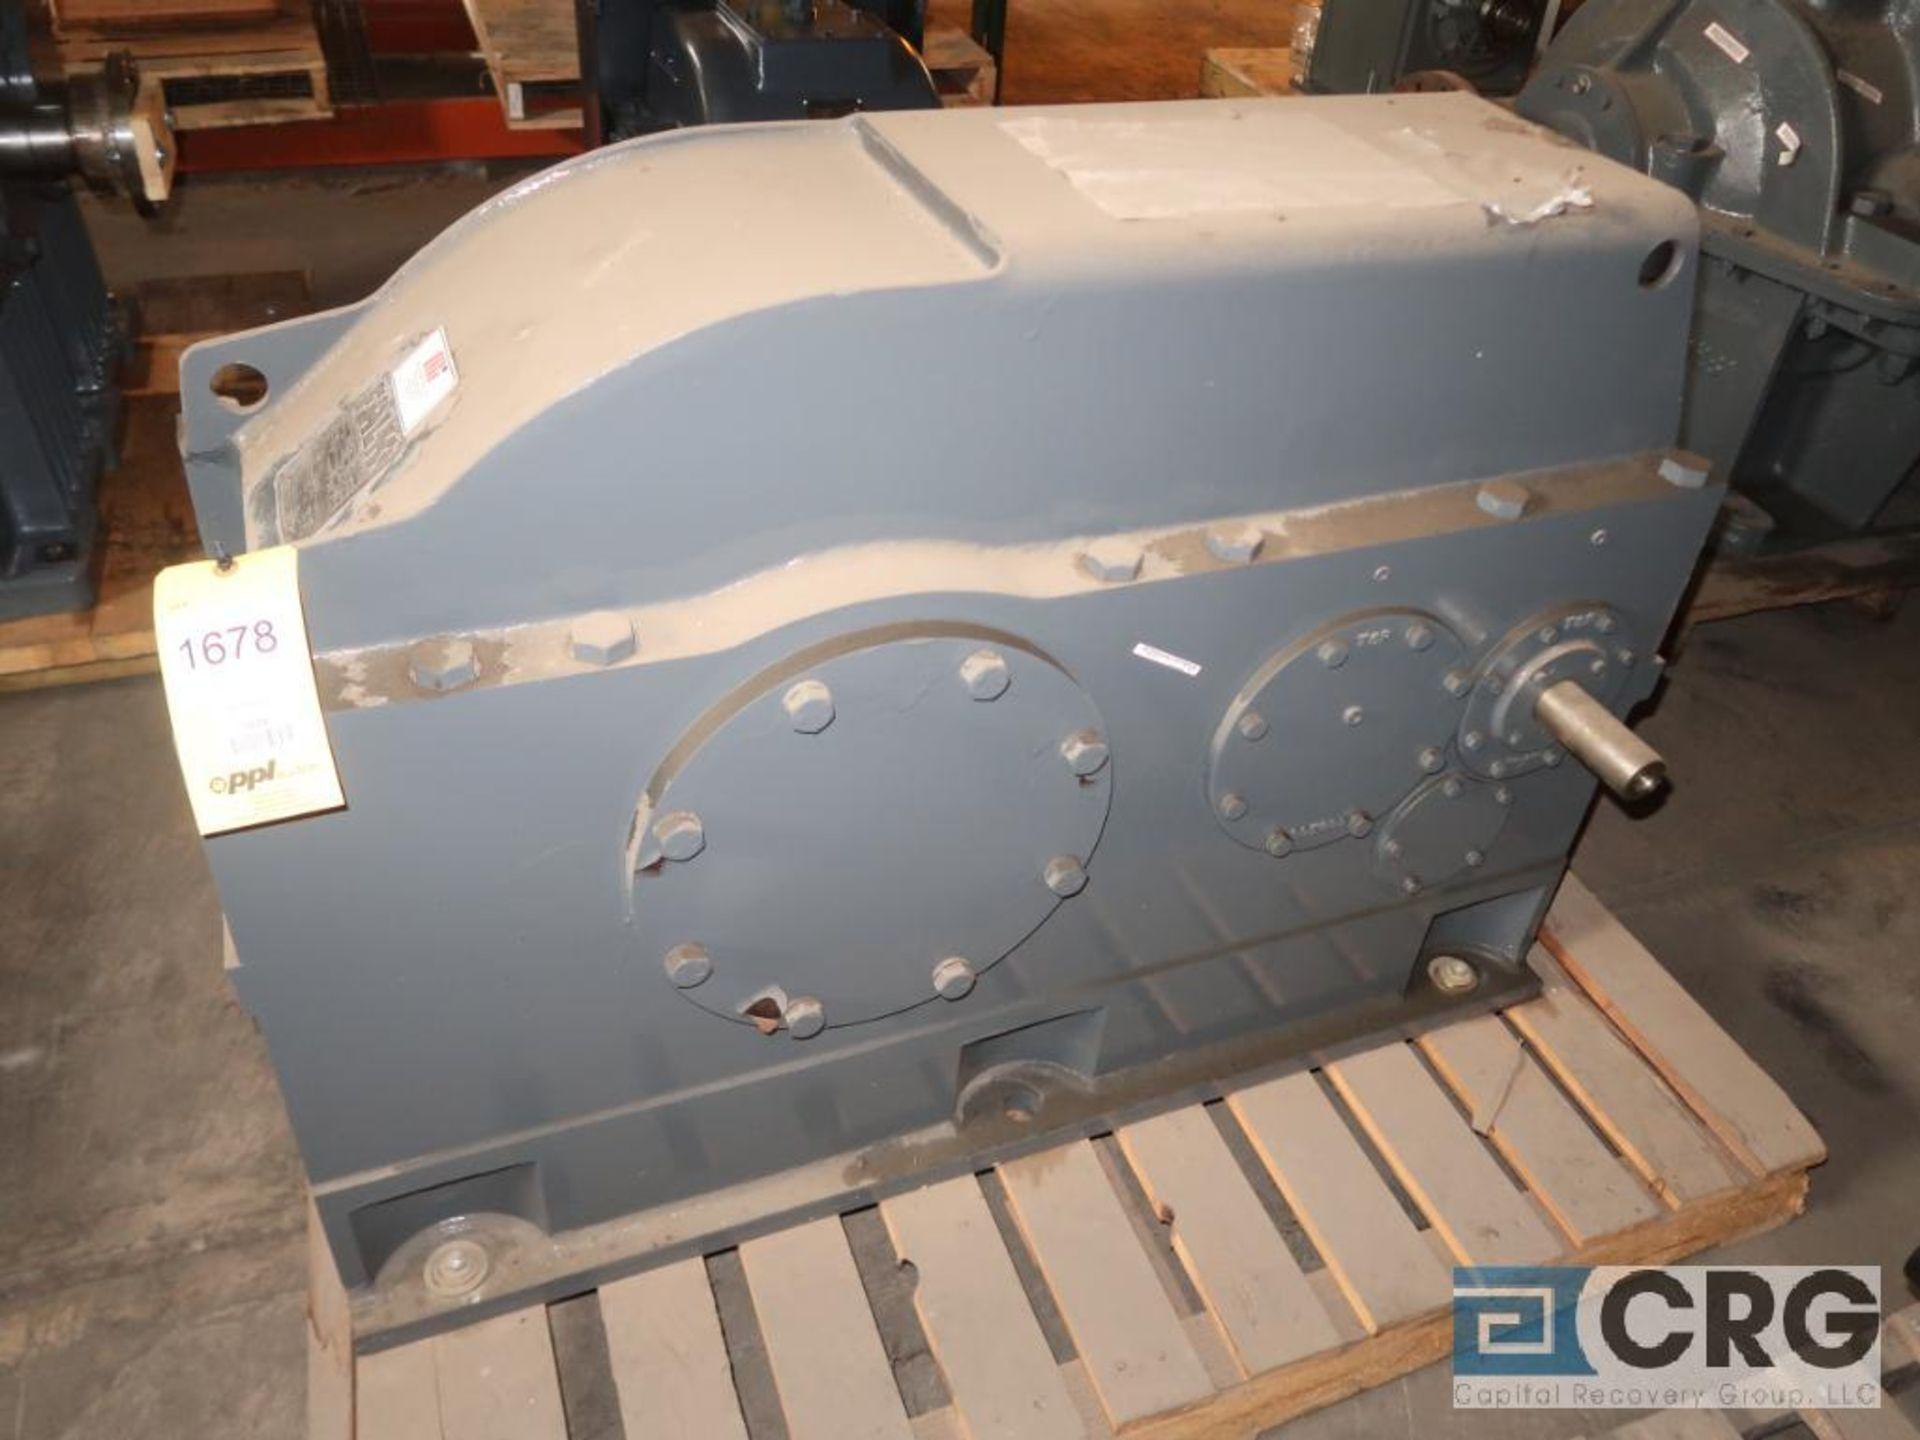 Falk 2110 Y3A gear drive, ratio-54.51, input RPM 839/315, output RPM 15.4/5.8, service rate HP.